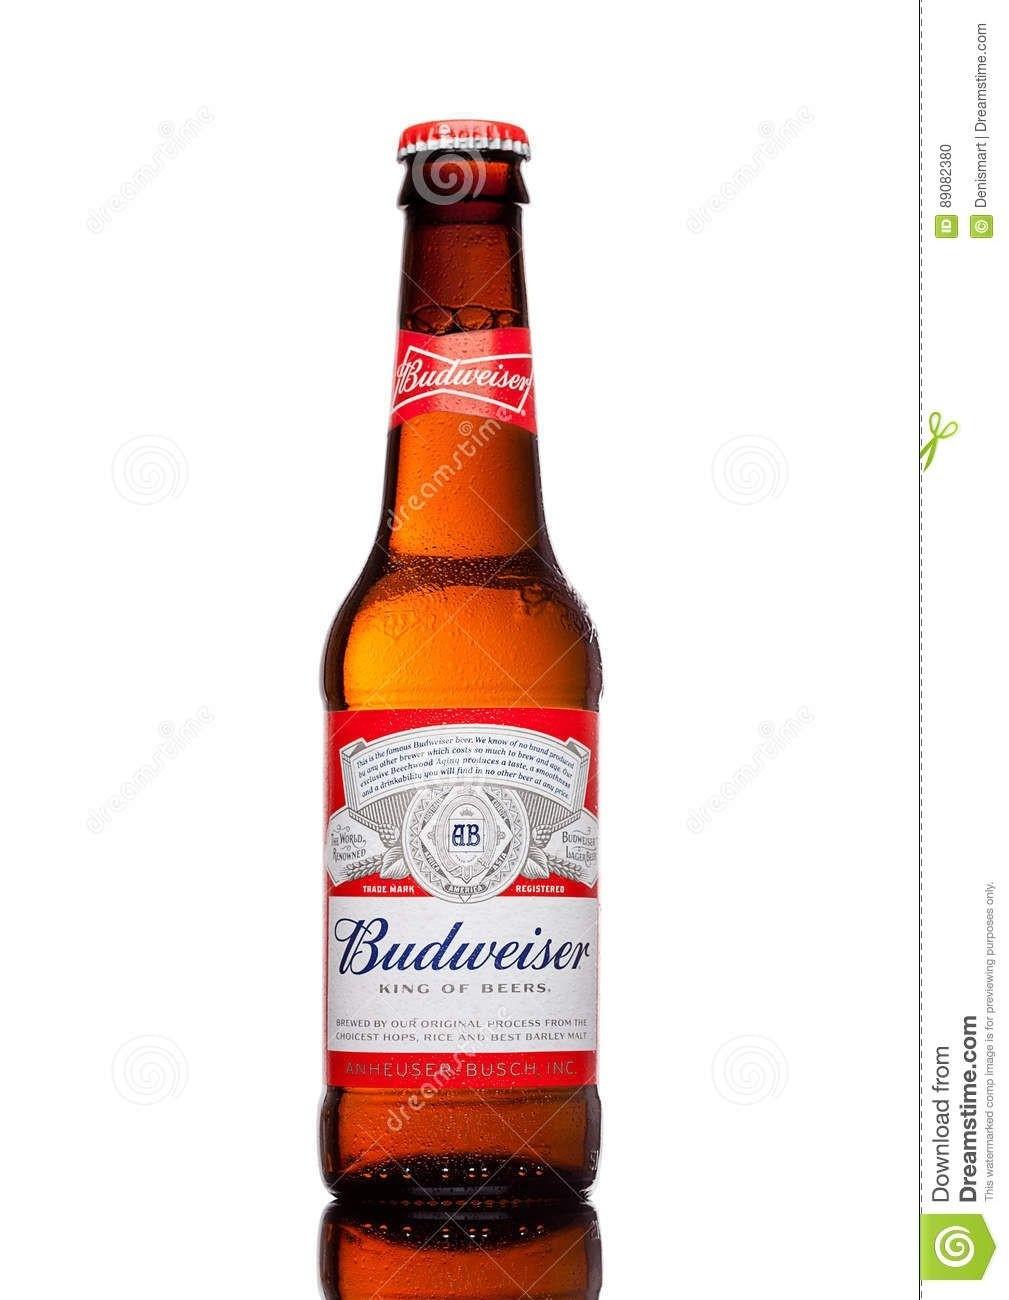 Budweiser 12 oz bottle